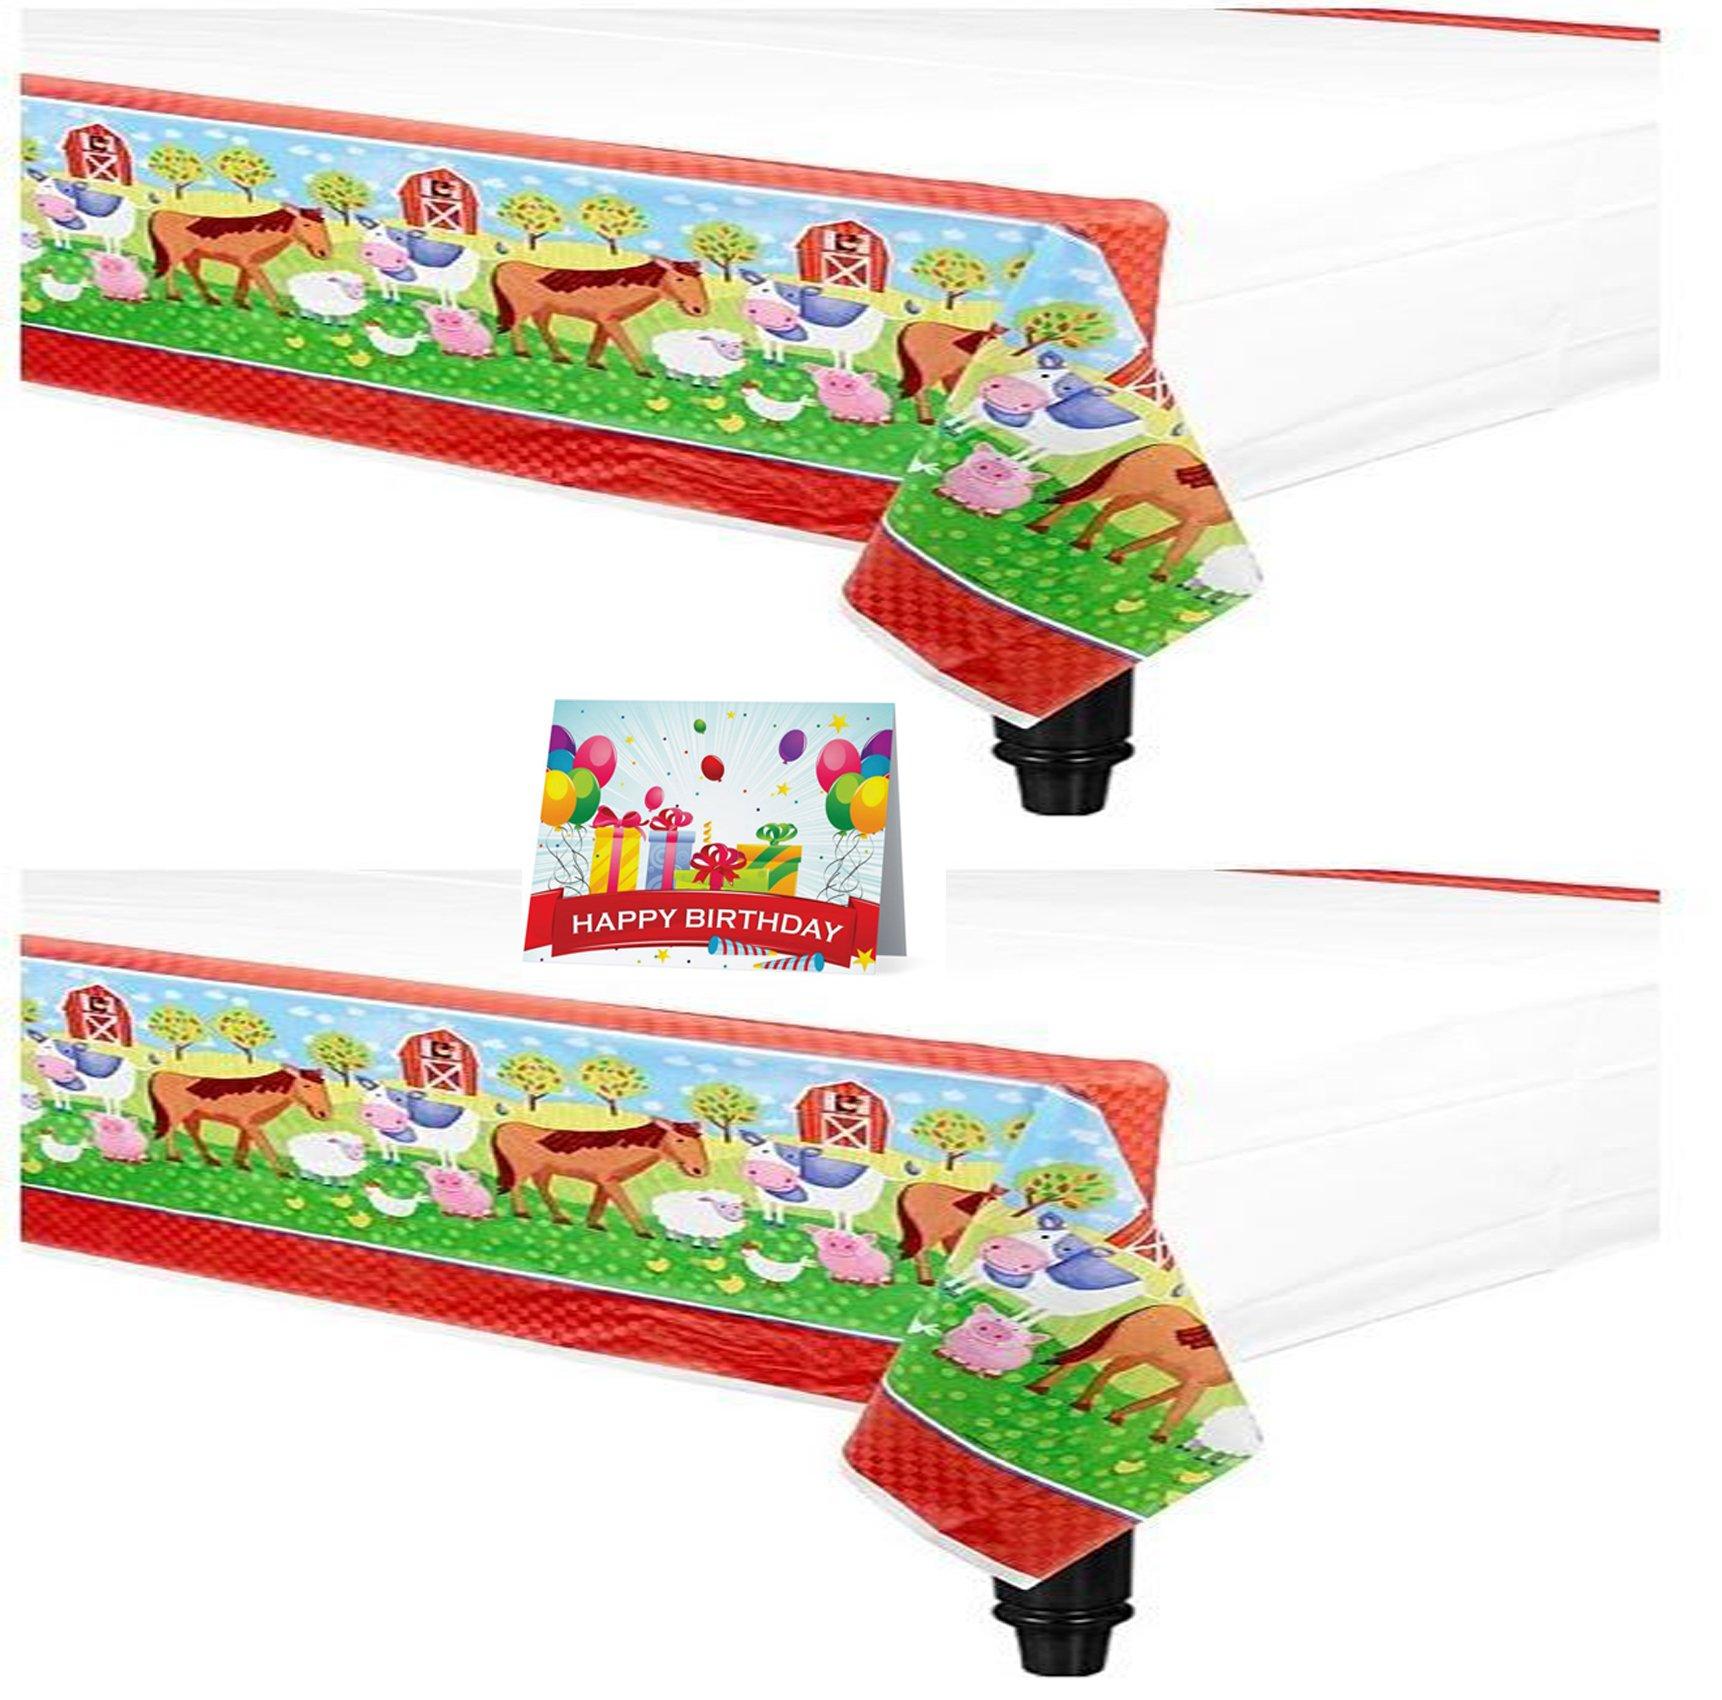 Barnyard Fun Animal Birthday Party Plastic Table Covers Bundle Pack of 2